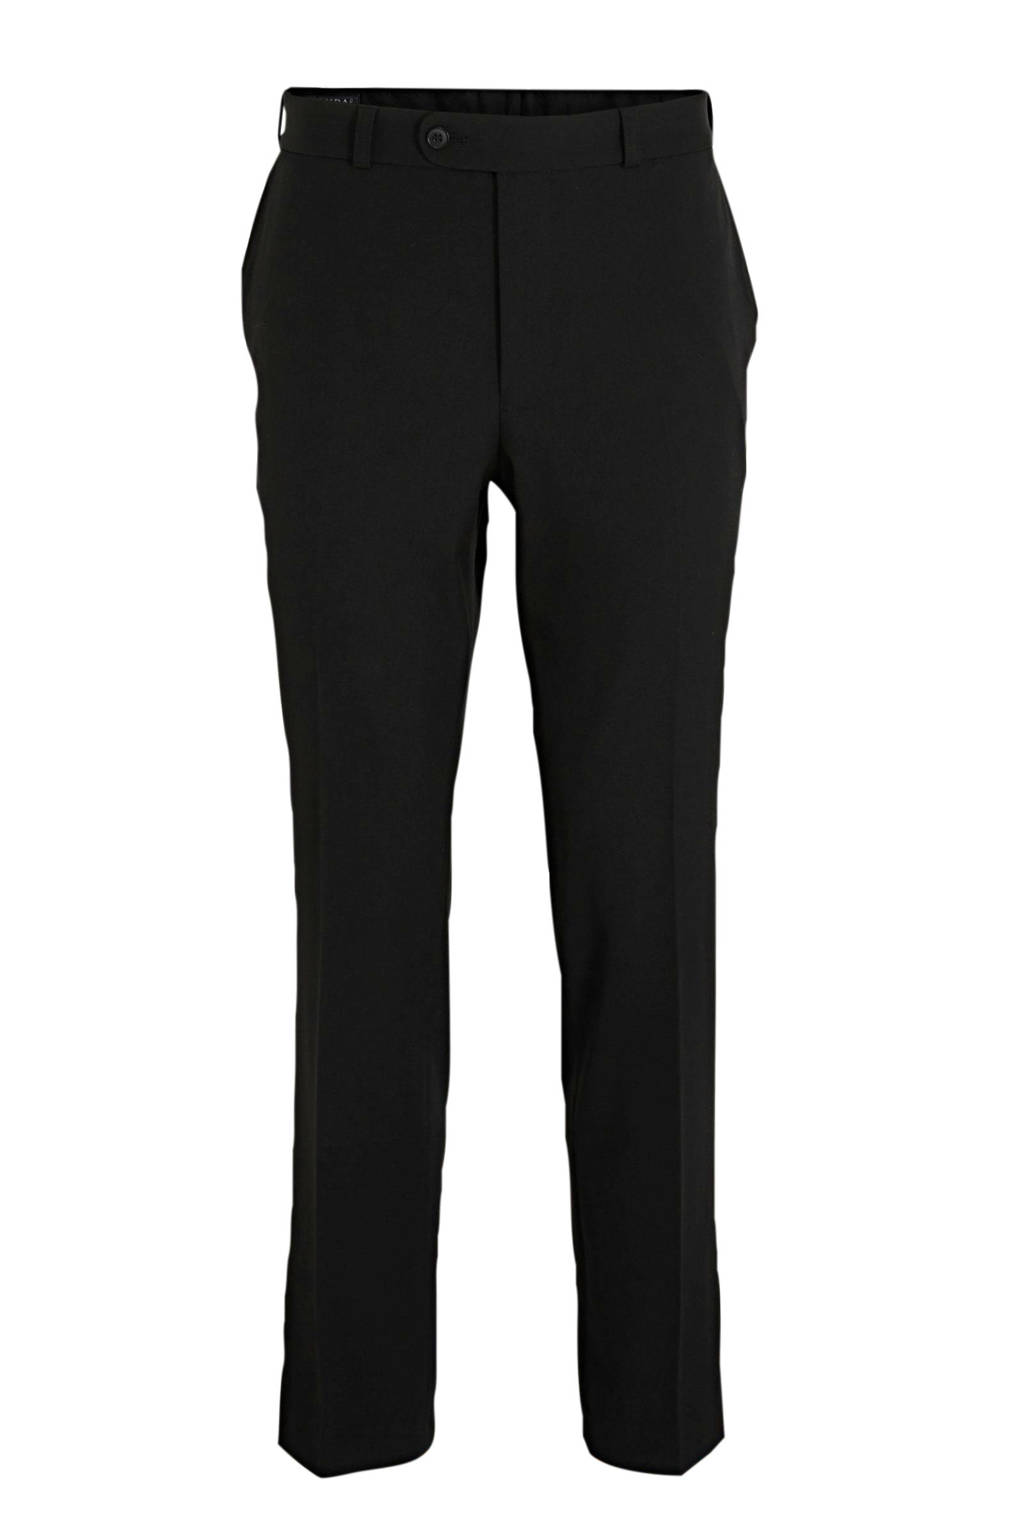 C&A Canda pantalon zwart, Zwart